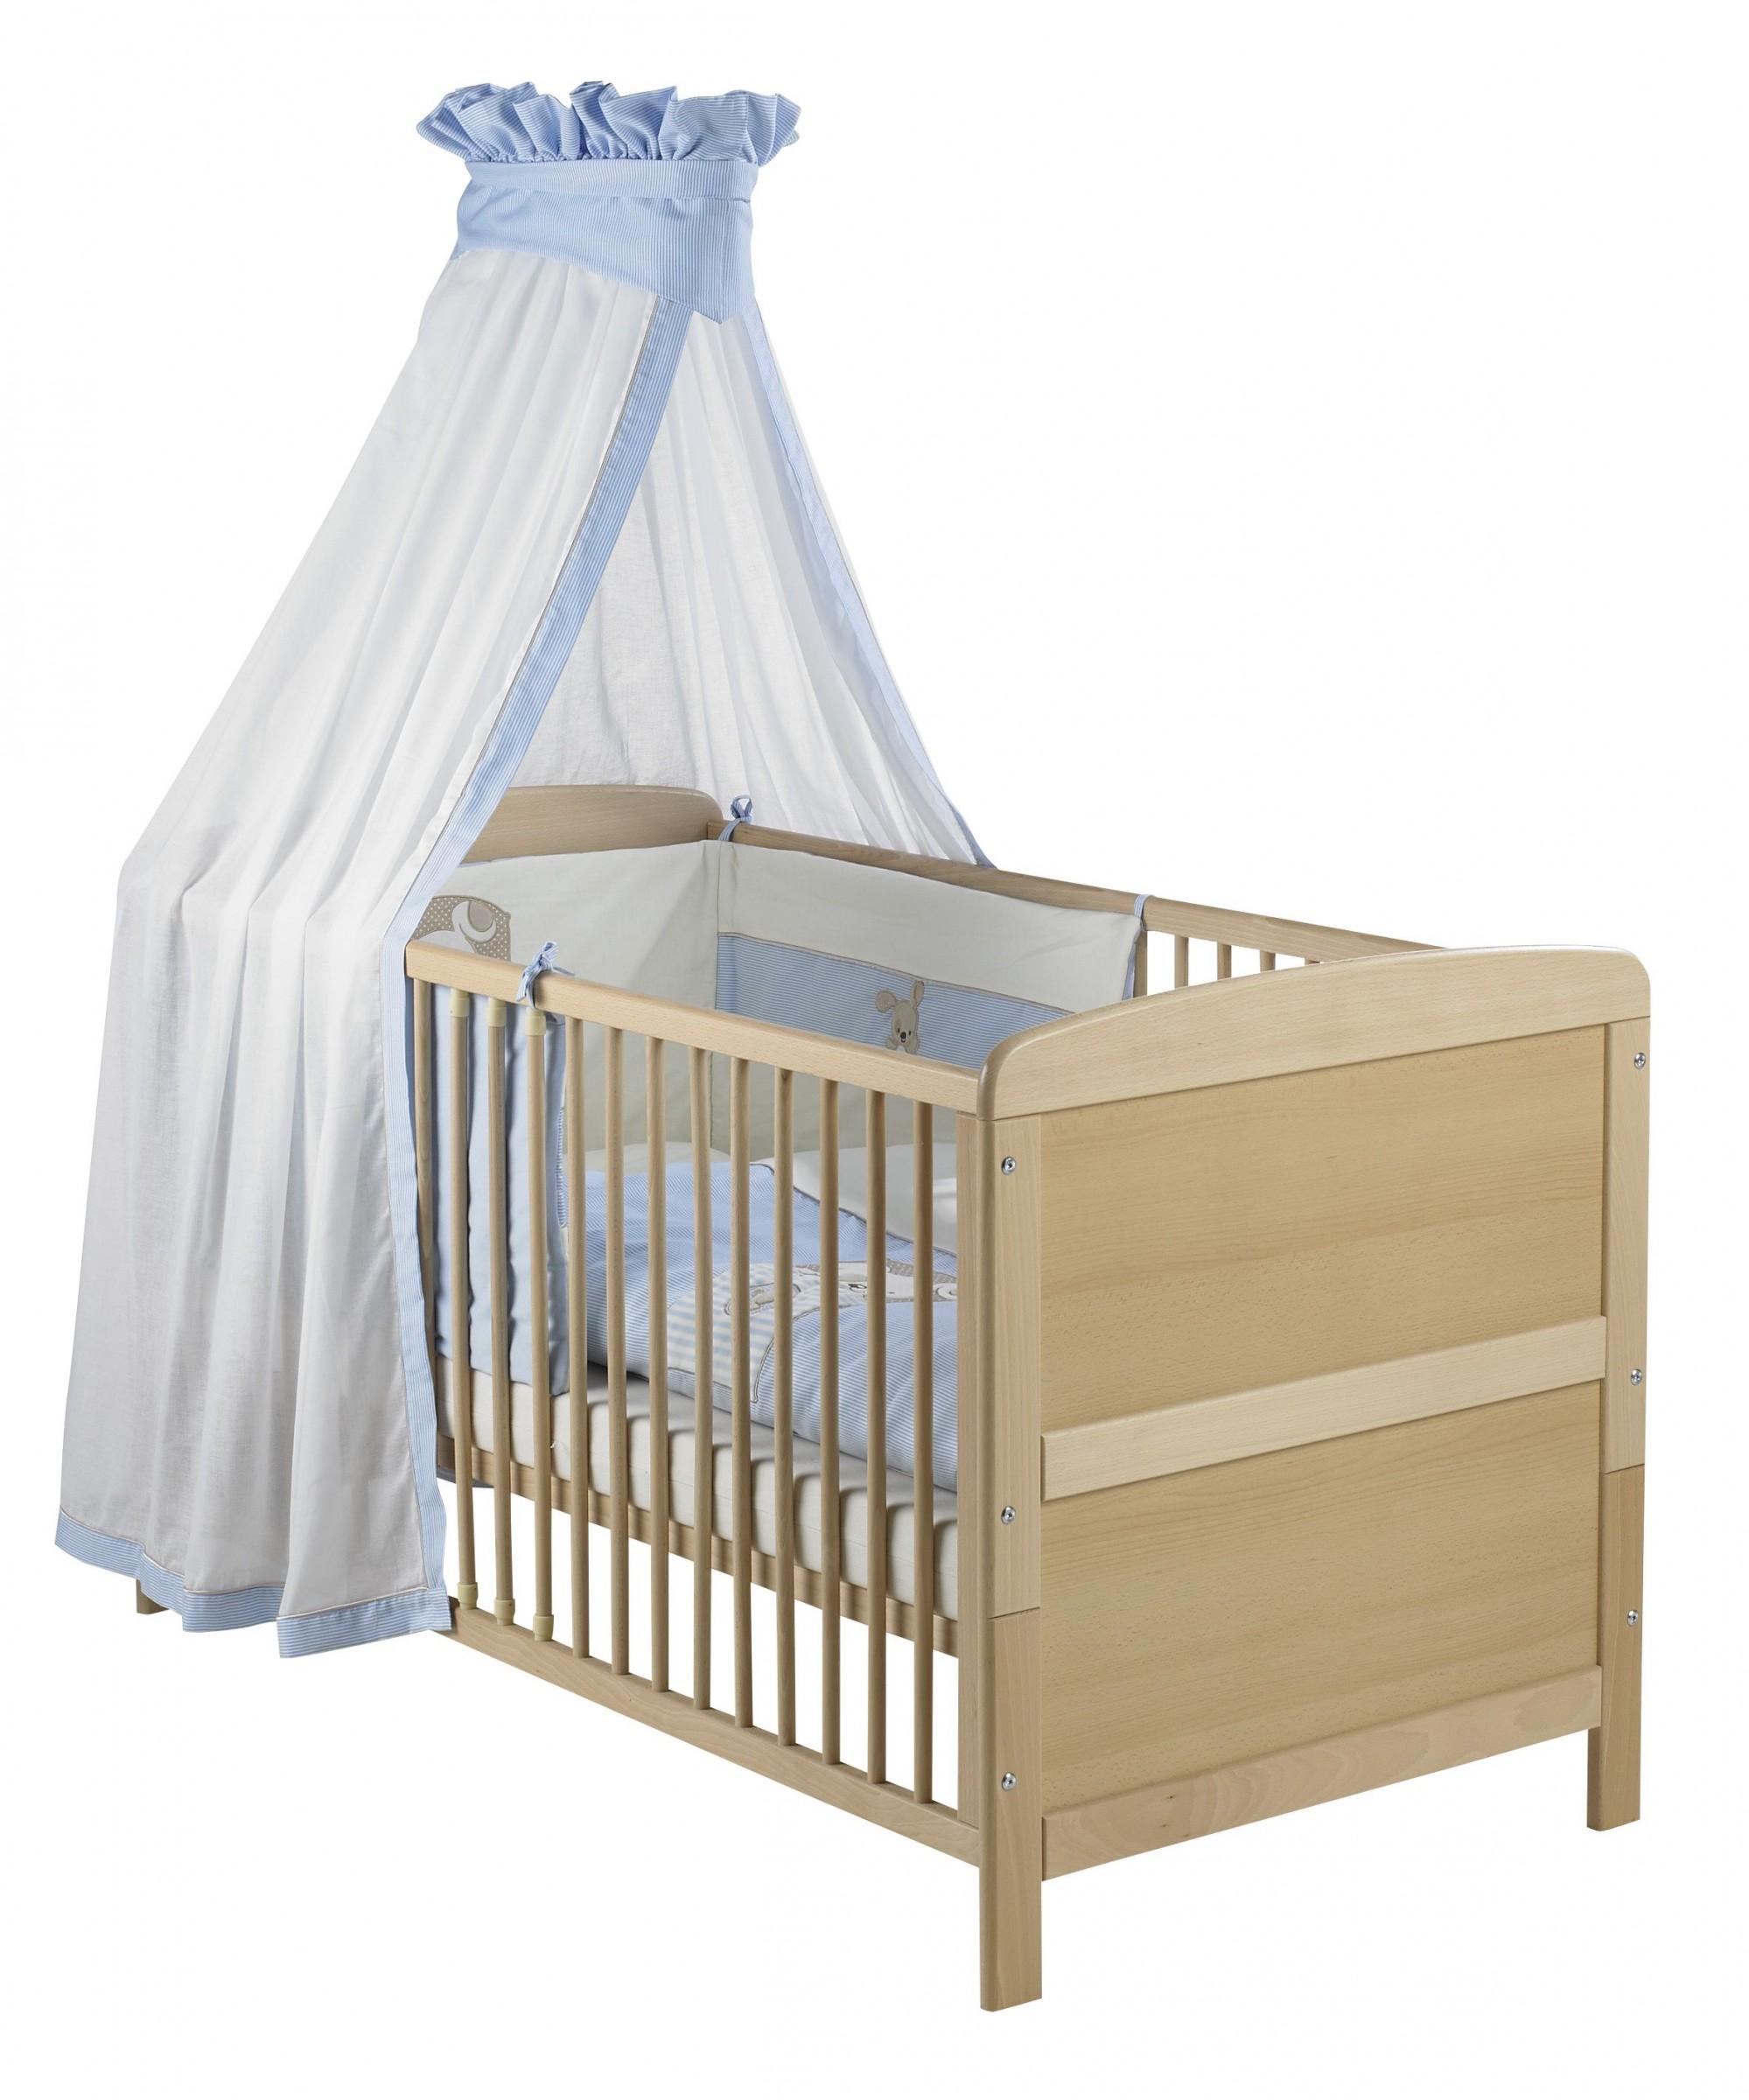 Geuther Kinderbett Pascal